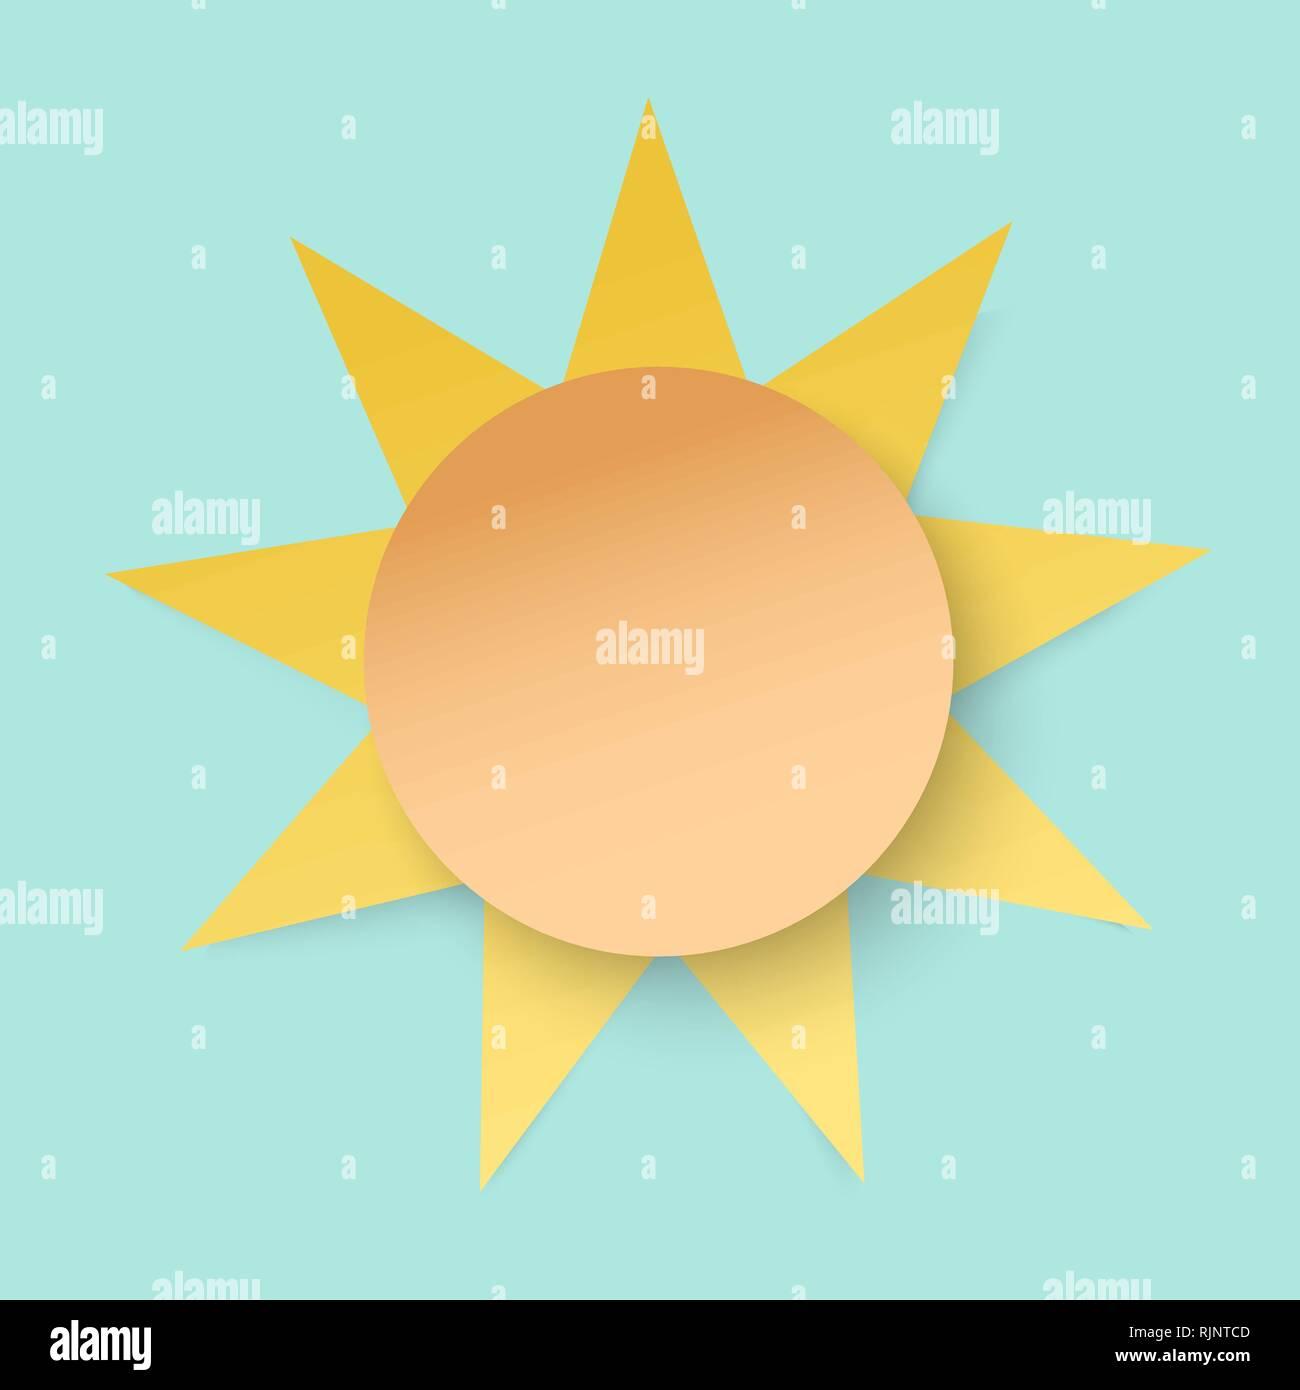 White paper cut sun. 3d paper art style. Weather illustration - Stock Image